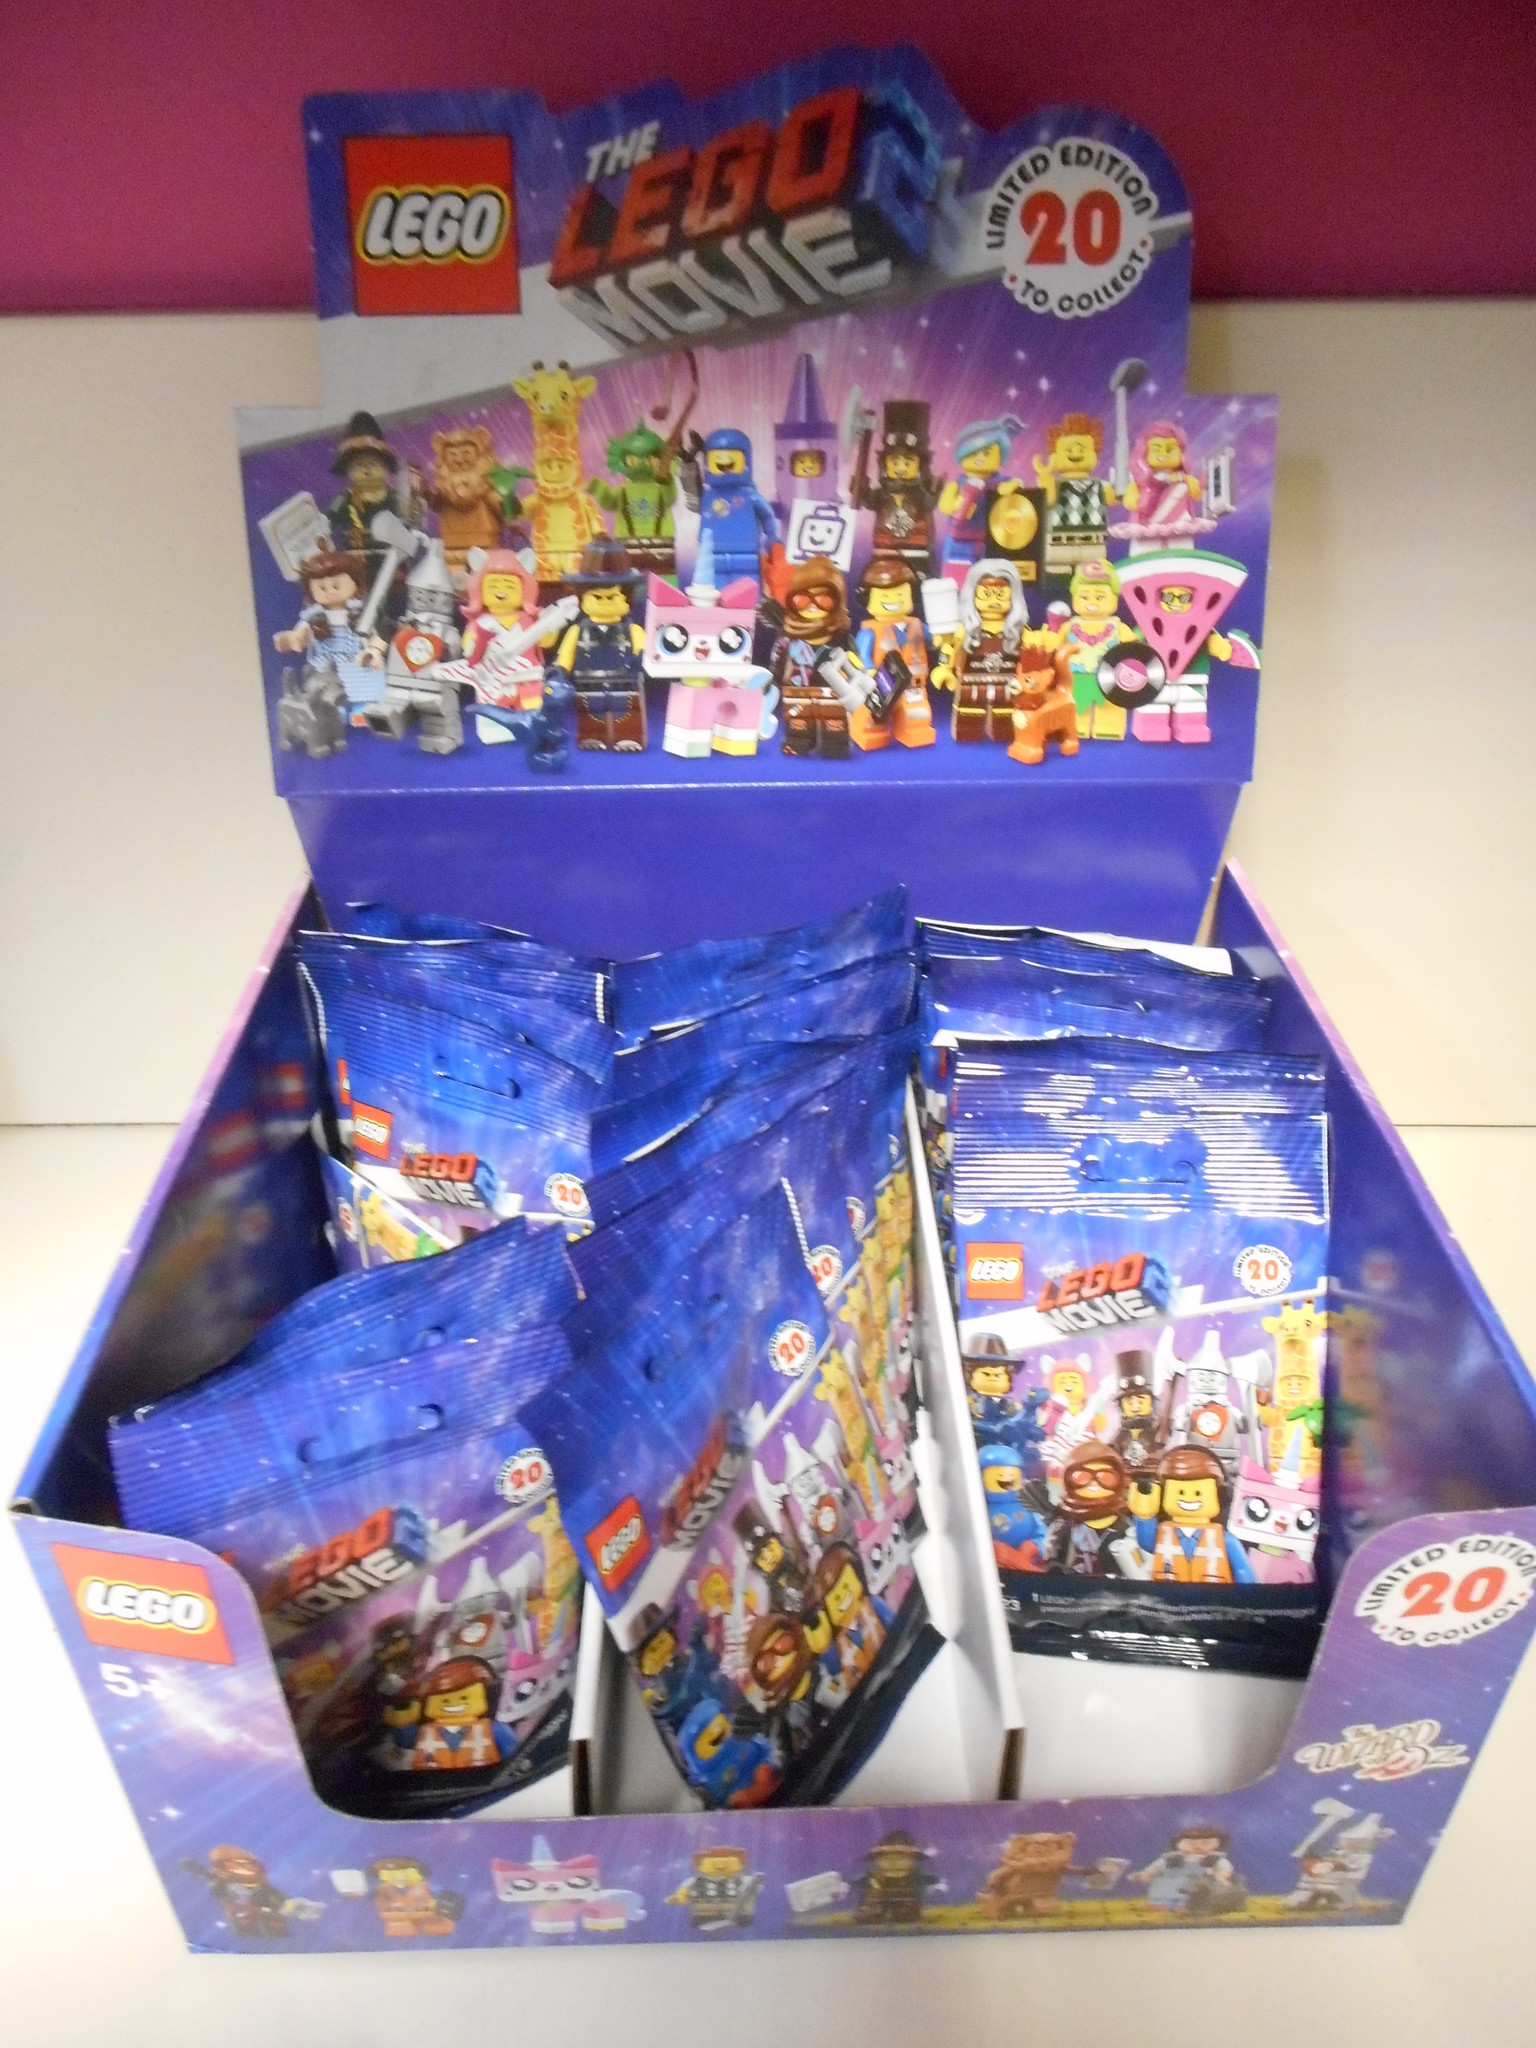 LEGO The Movie 2 Minifigures